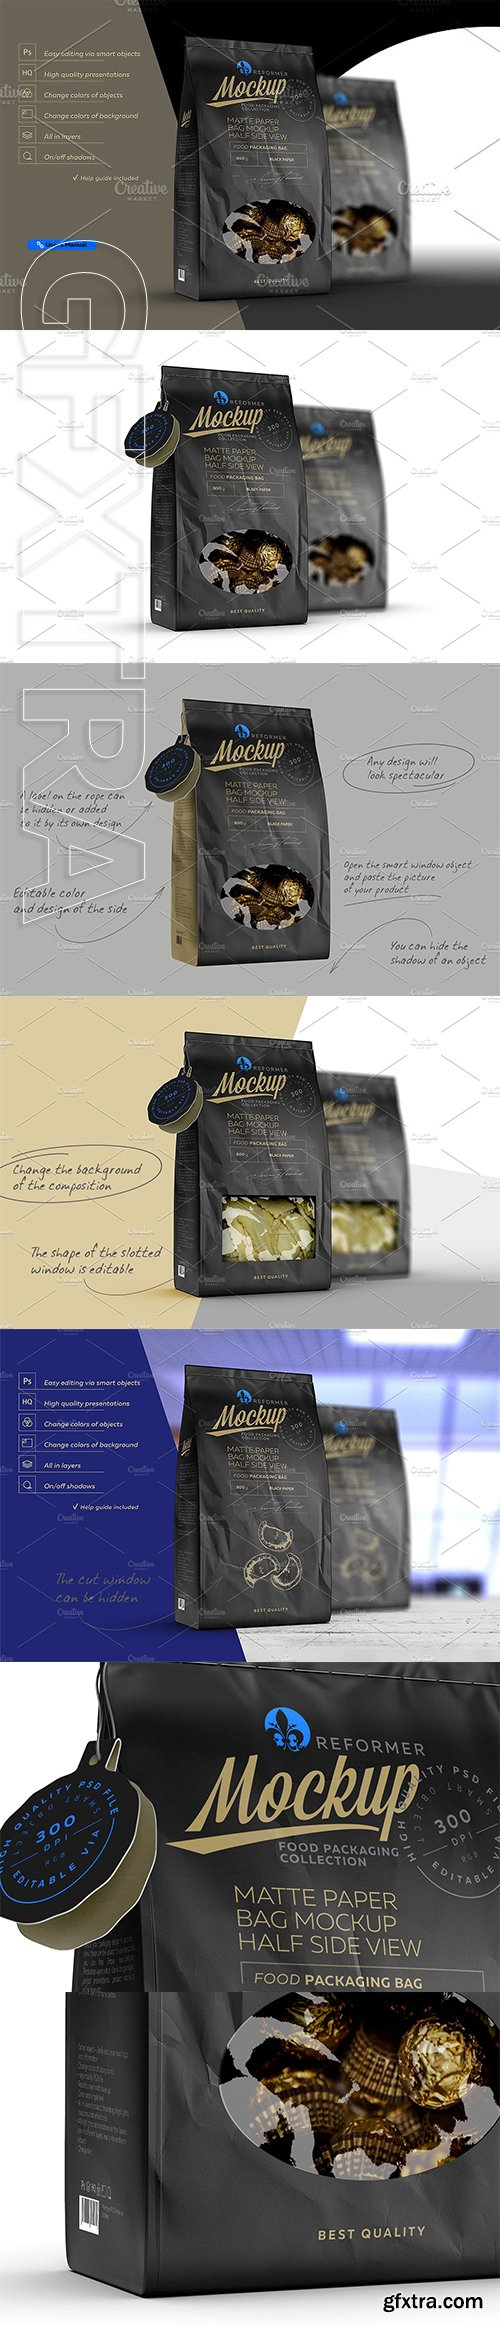 CreativeMarket - Black Paper Bag With Window Mock-up 2217700